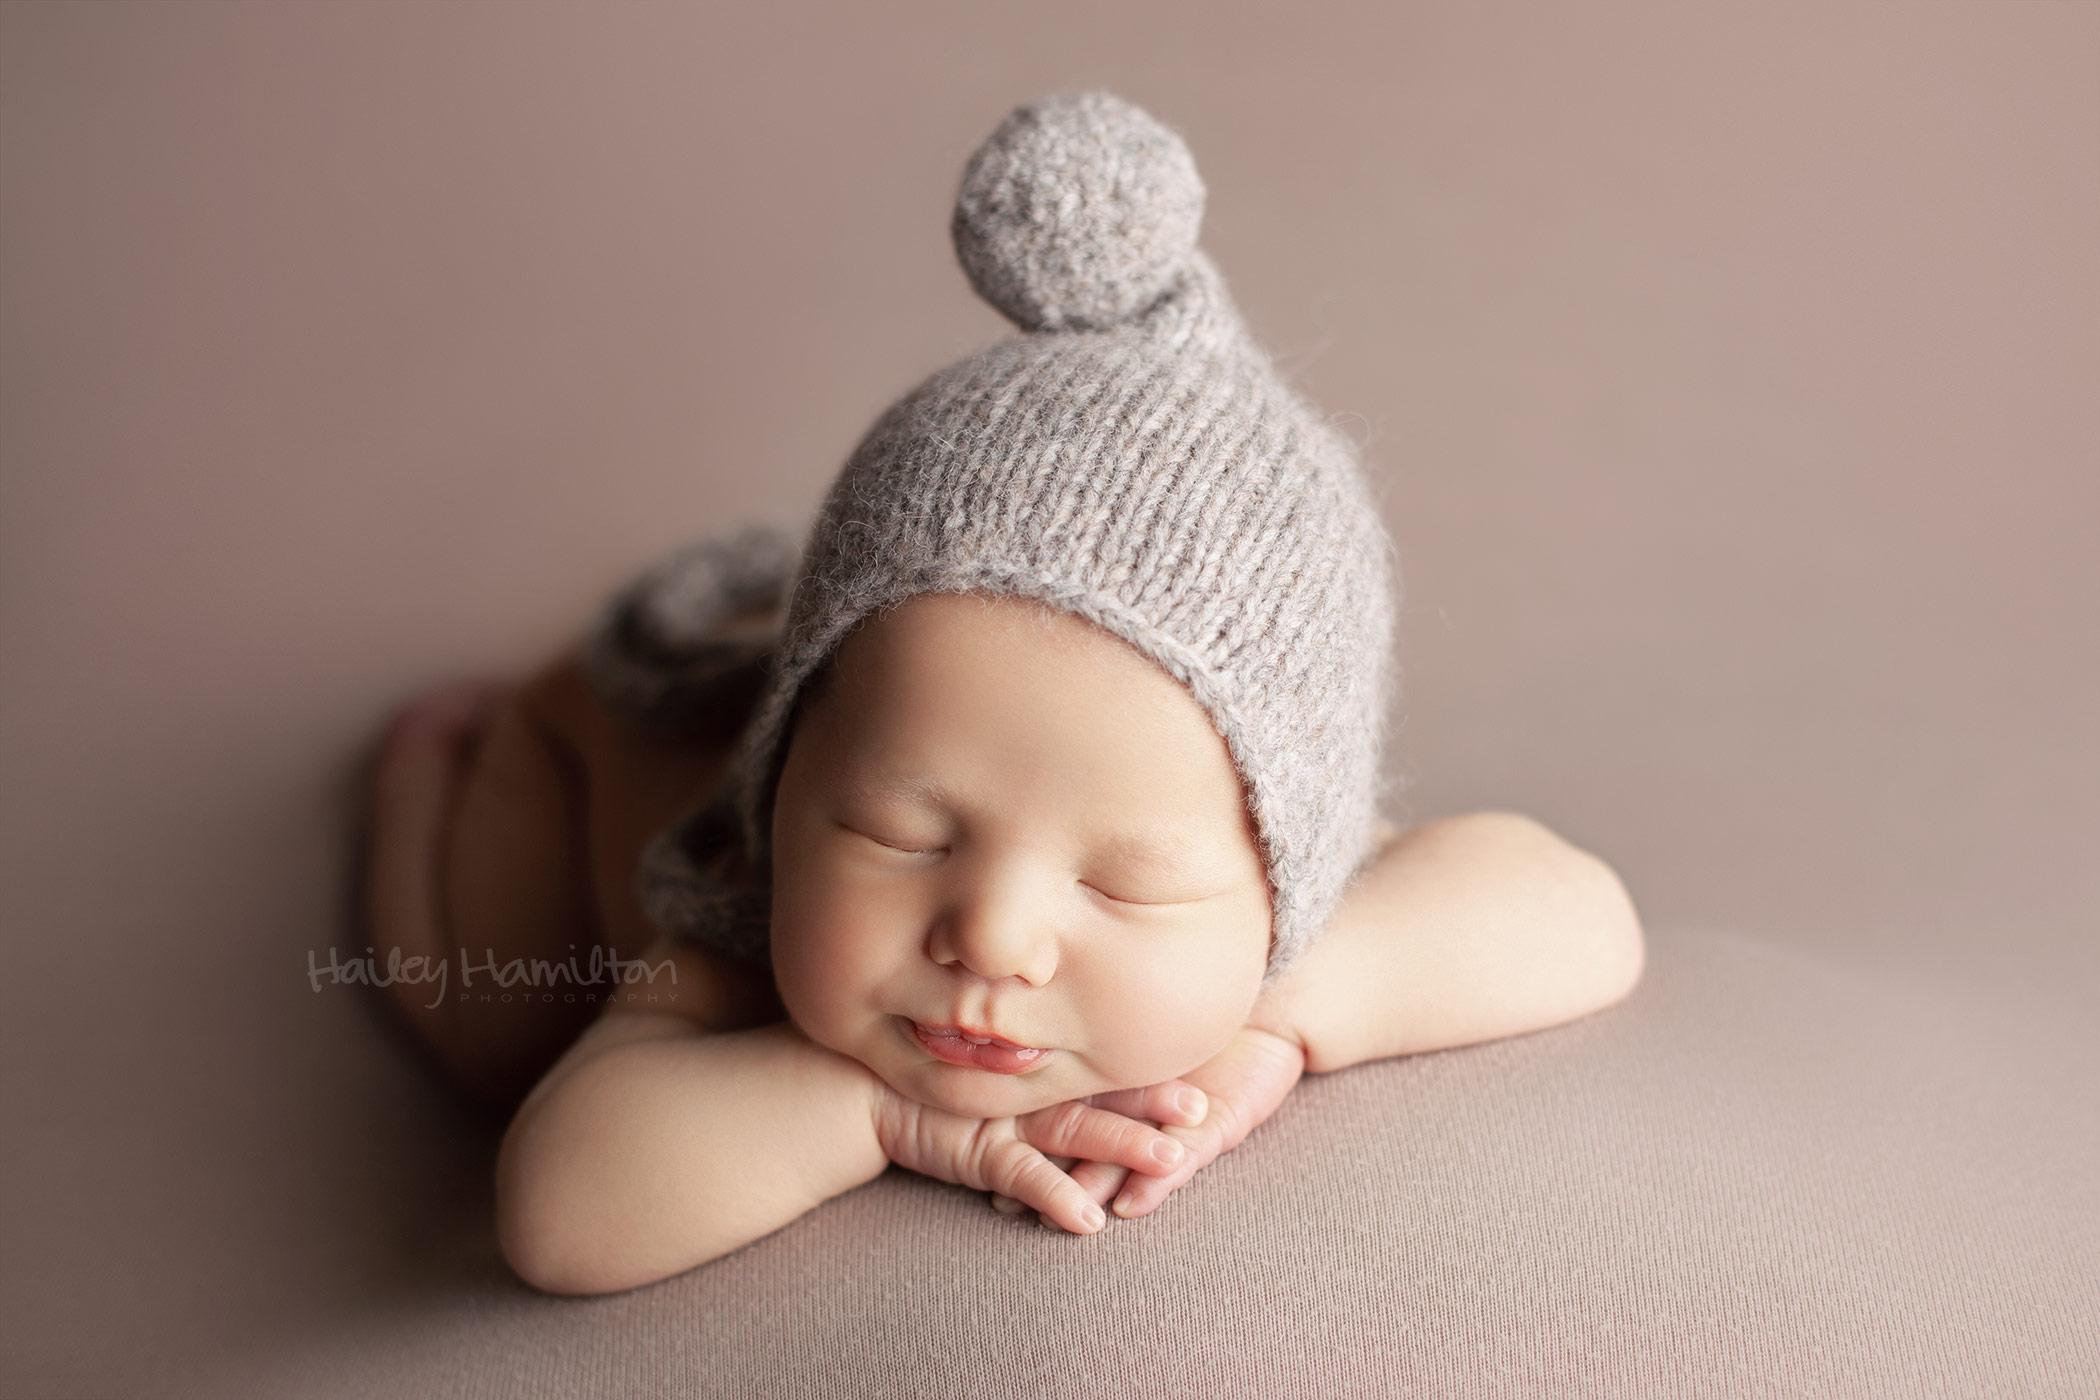 Newborn-photographer-Calgary-new-born-baby-photography-studio